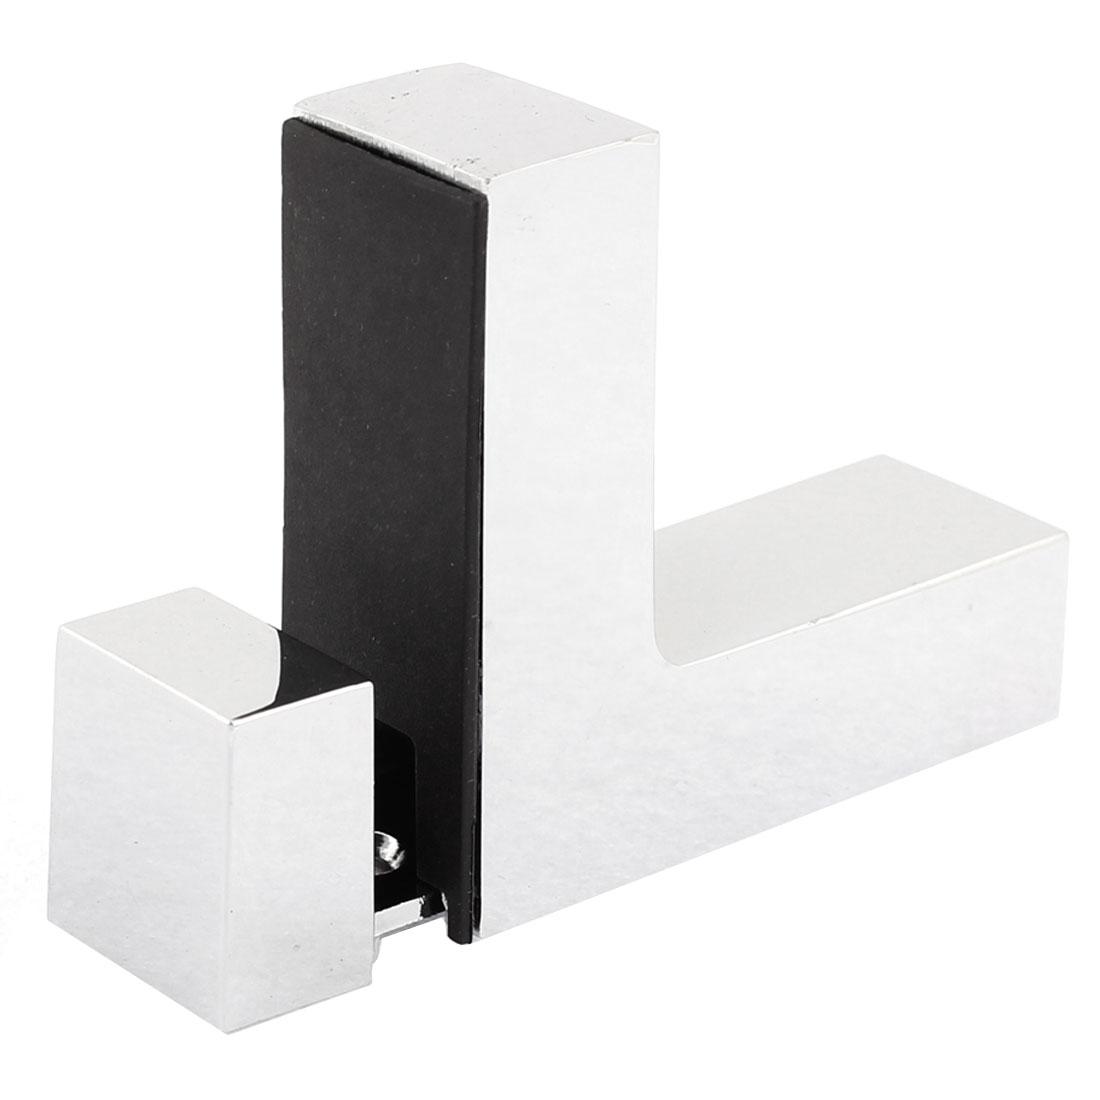 L Shaped Adjustable Glass Clip Clamp Bracket